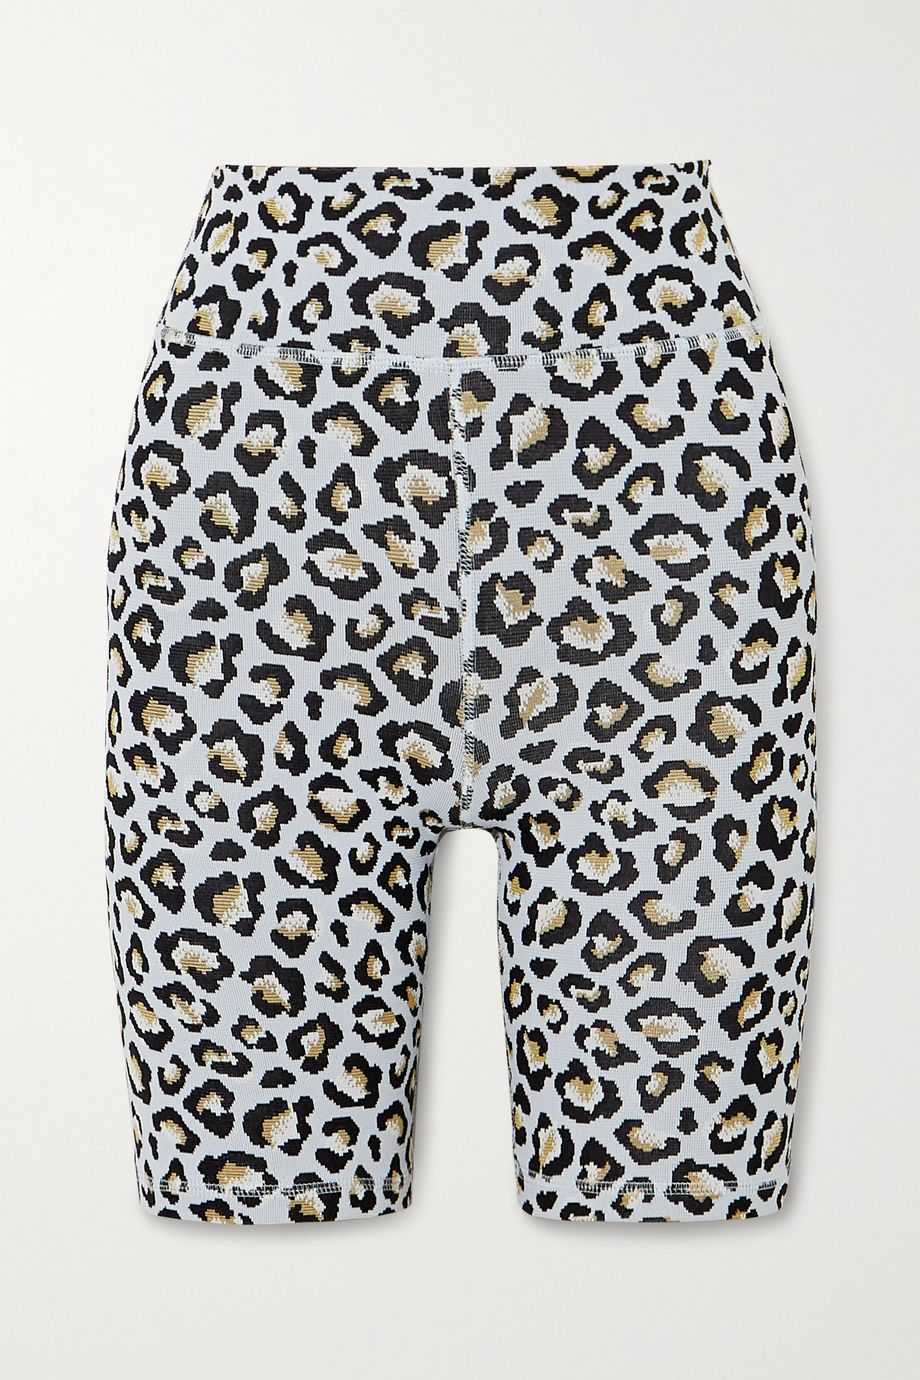 The Upside Leopard jacquard-knit shorts